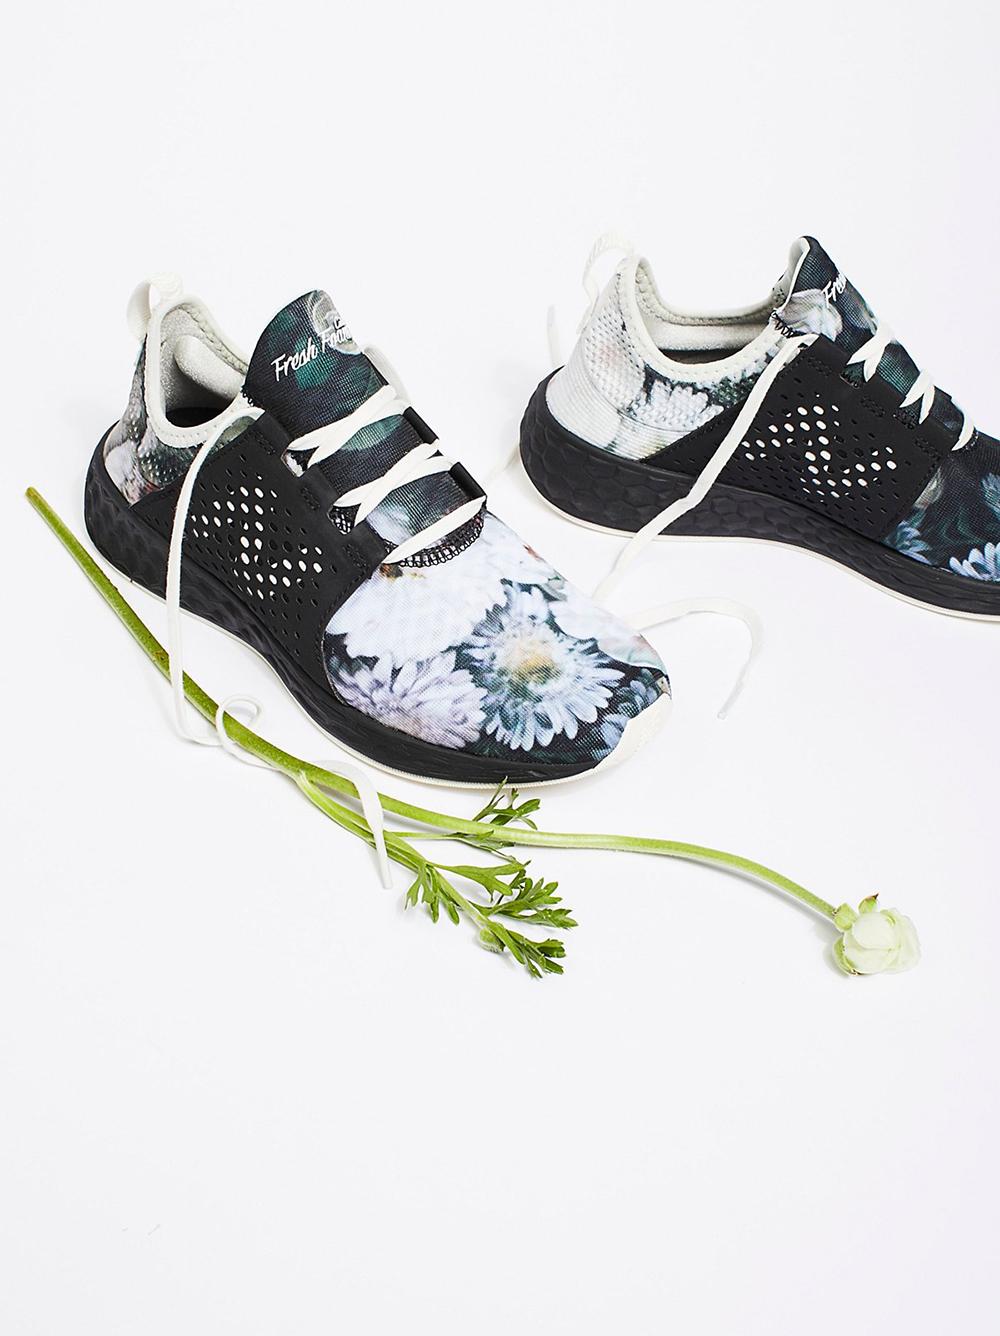 New Balance Fresh Foam Floral Trainer - Statement shoes